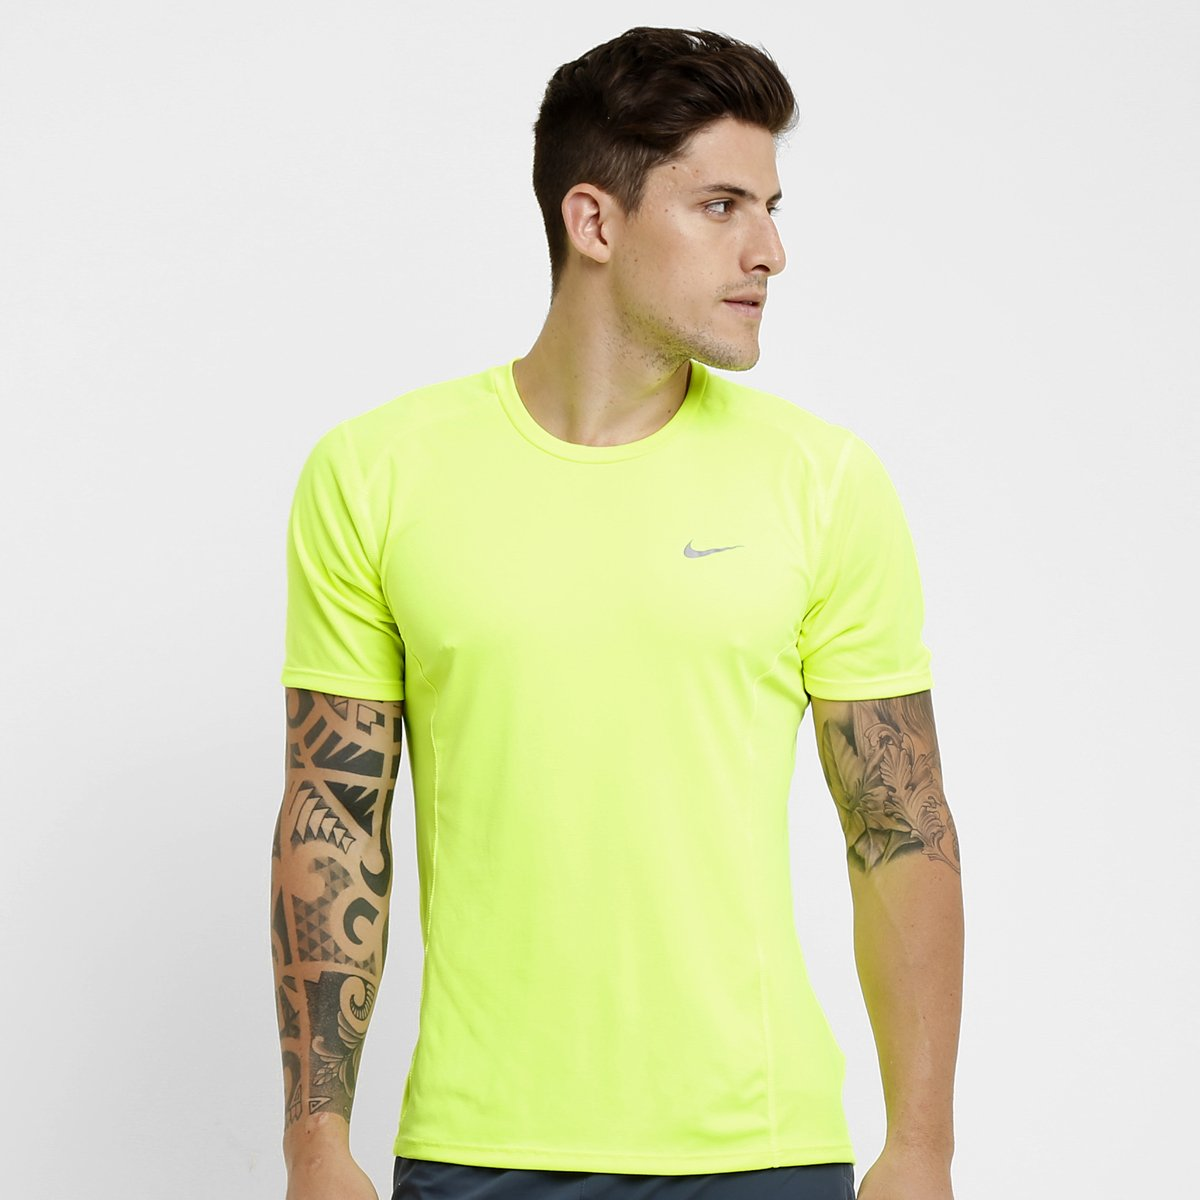 308ed5d0eb893 Camiseta Nike Dri-Fit Miler - Compre Agora